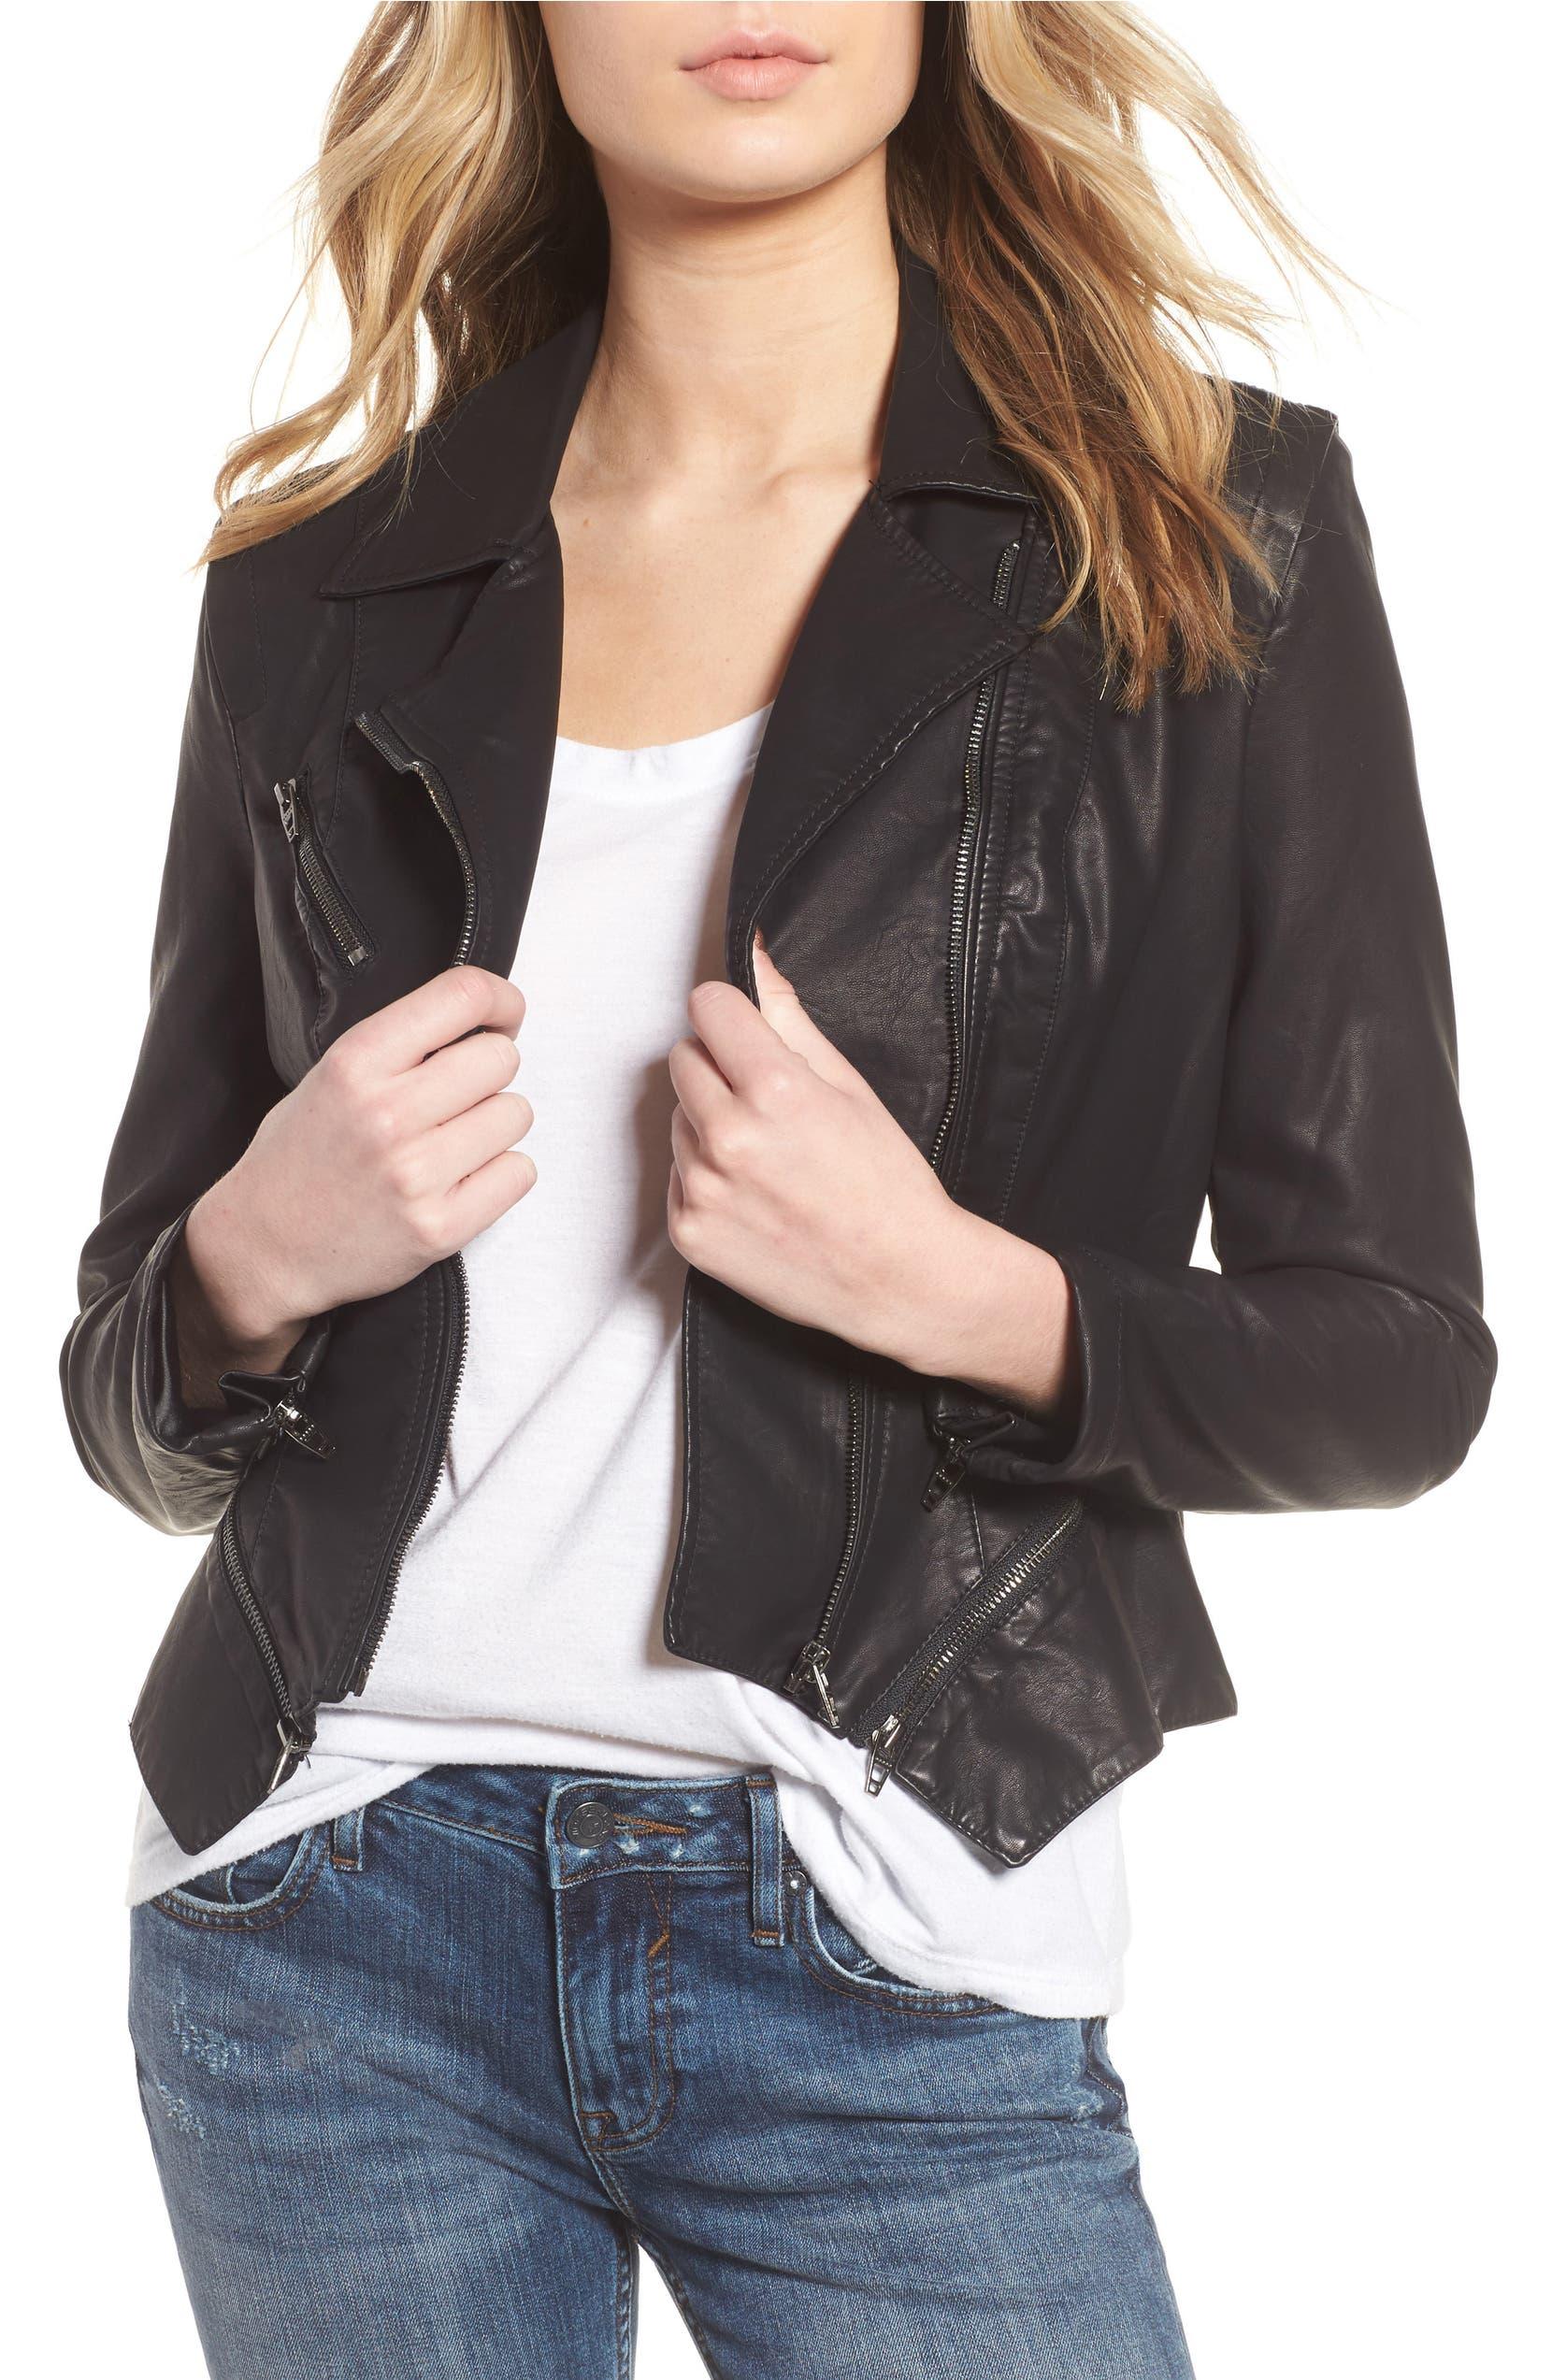 be98b5265 BLANKNYC Faux Leather Moto Jacket (Regular & Plus Size) | Nordstrom